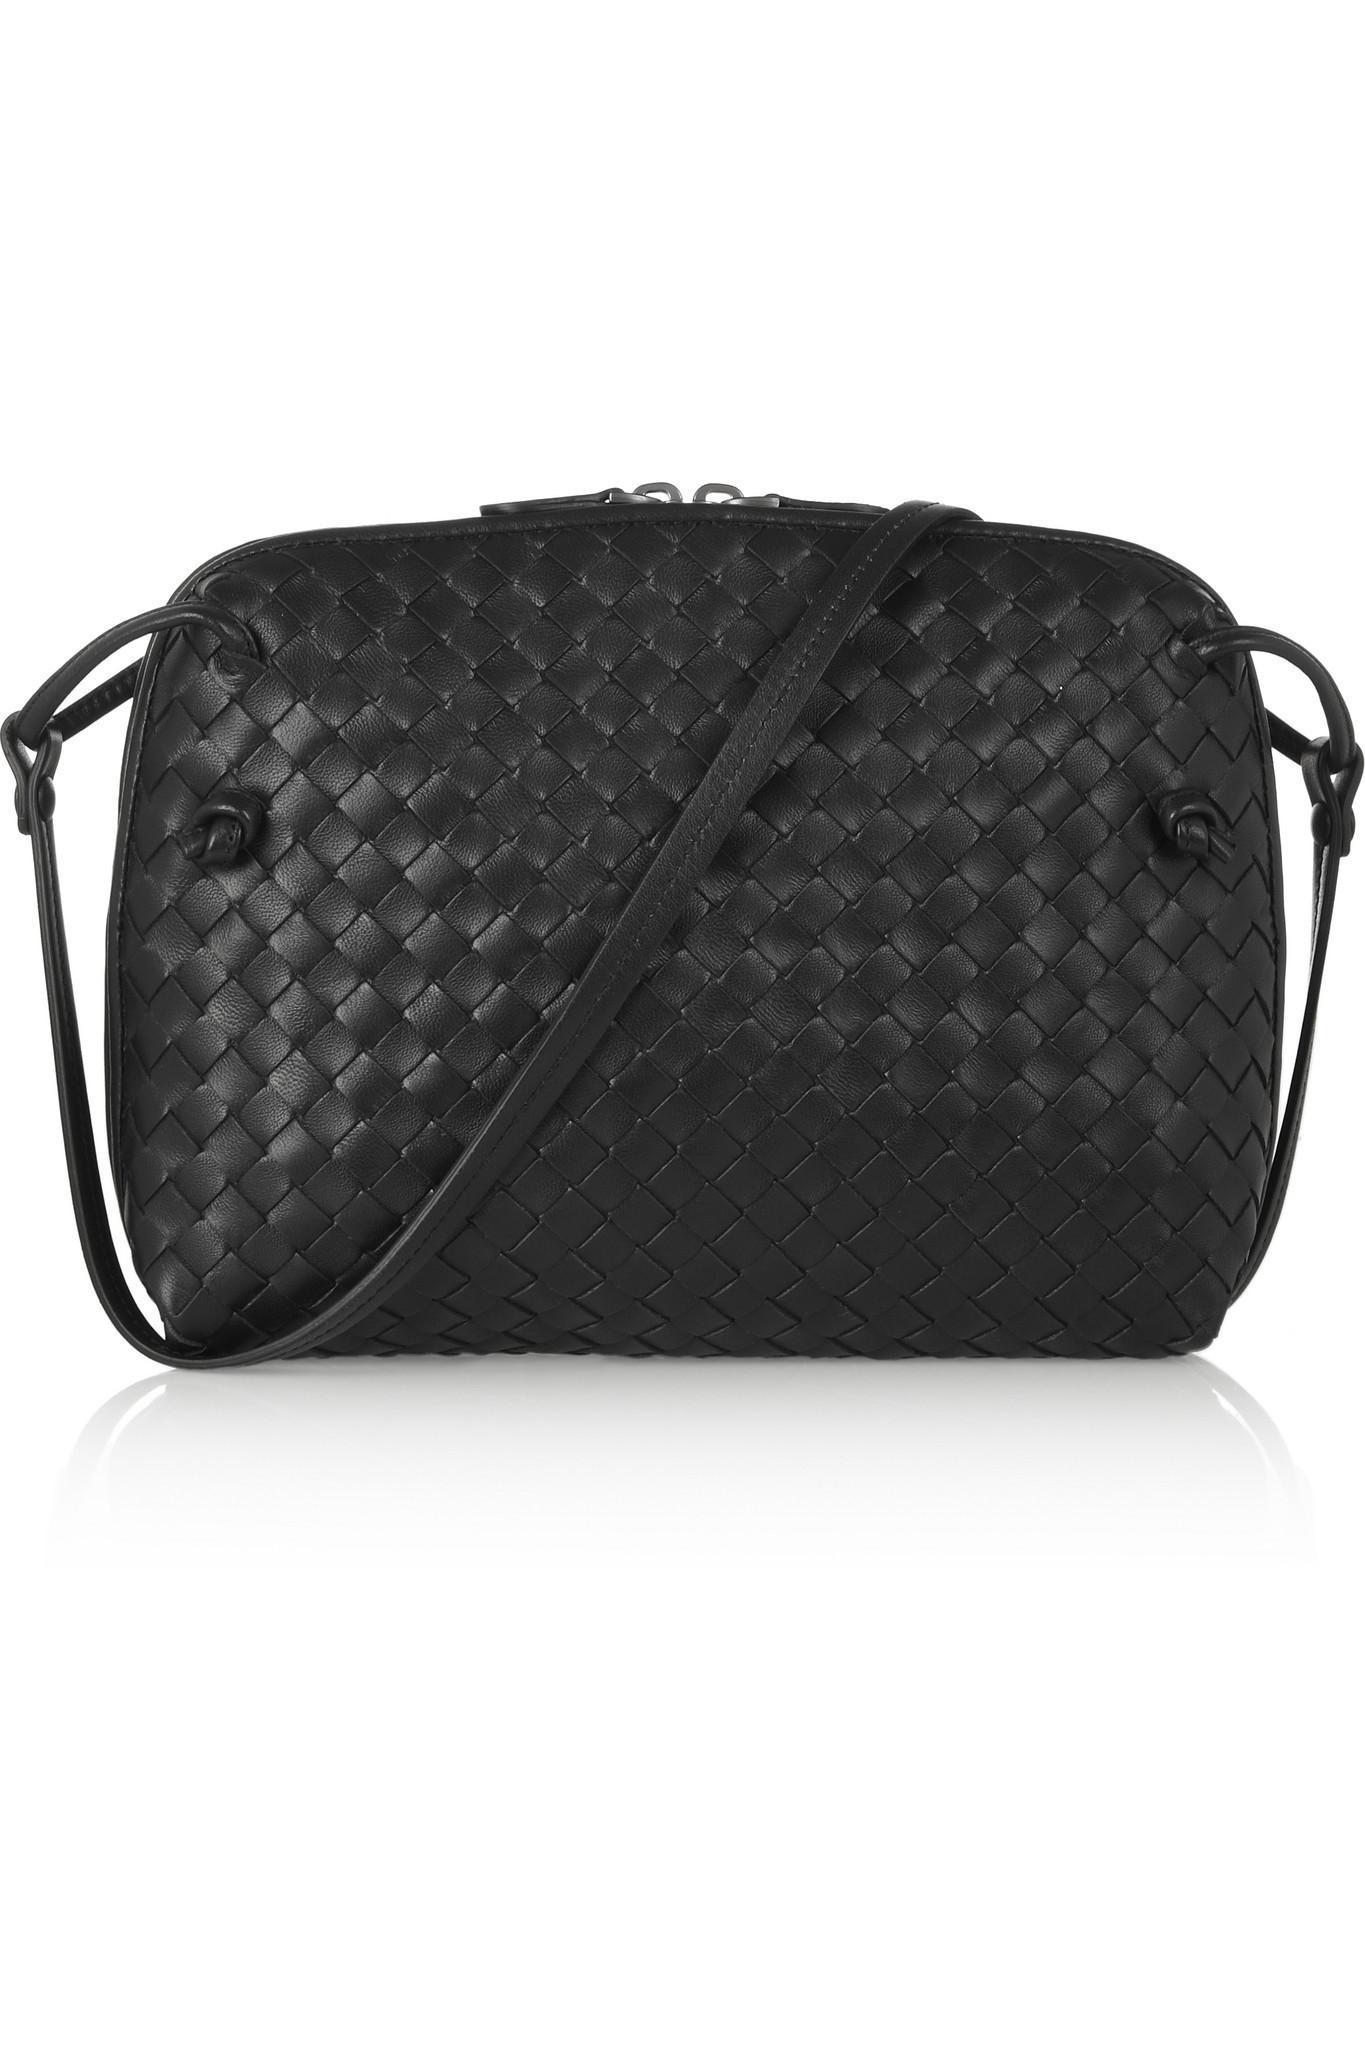 945741888d Bottega Veneta. Women s Black Nodini Small Intrecciato Leather Shoulder Bag